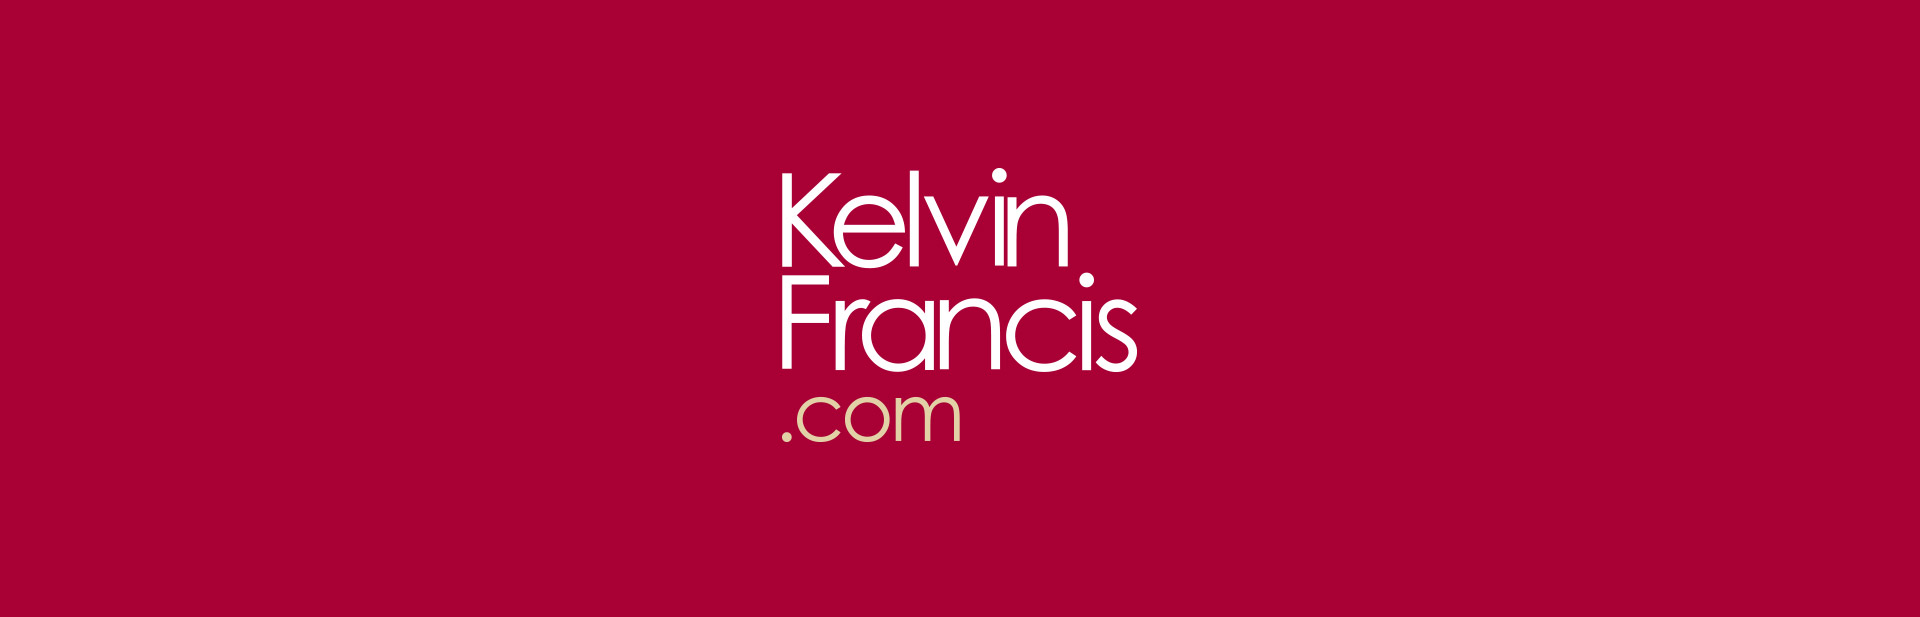 Kelvin Francis Estate Agents